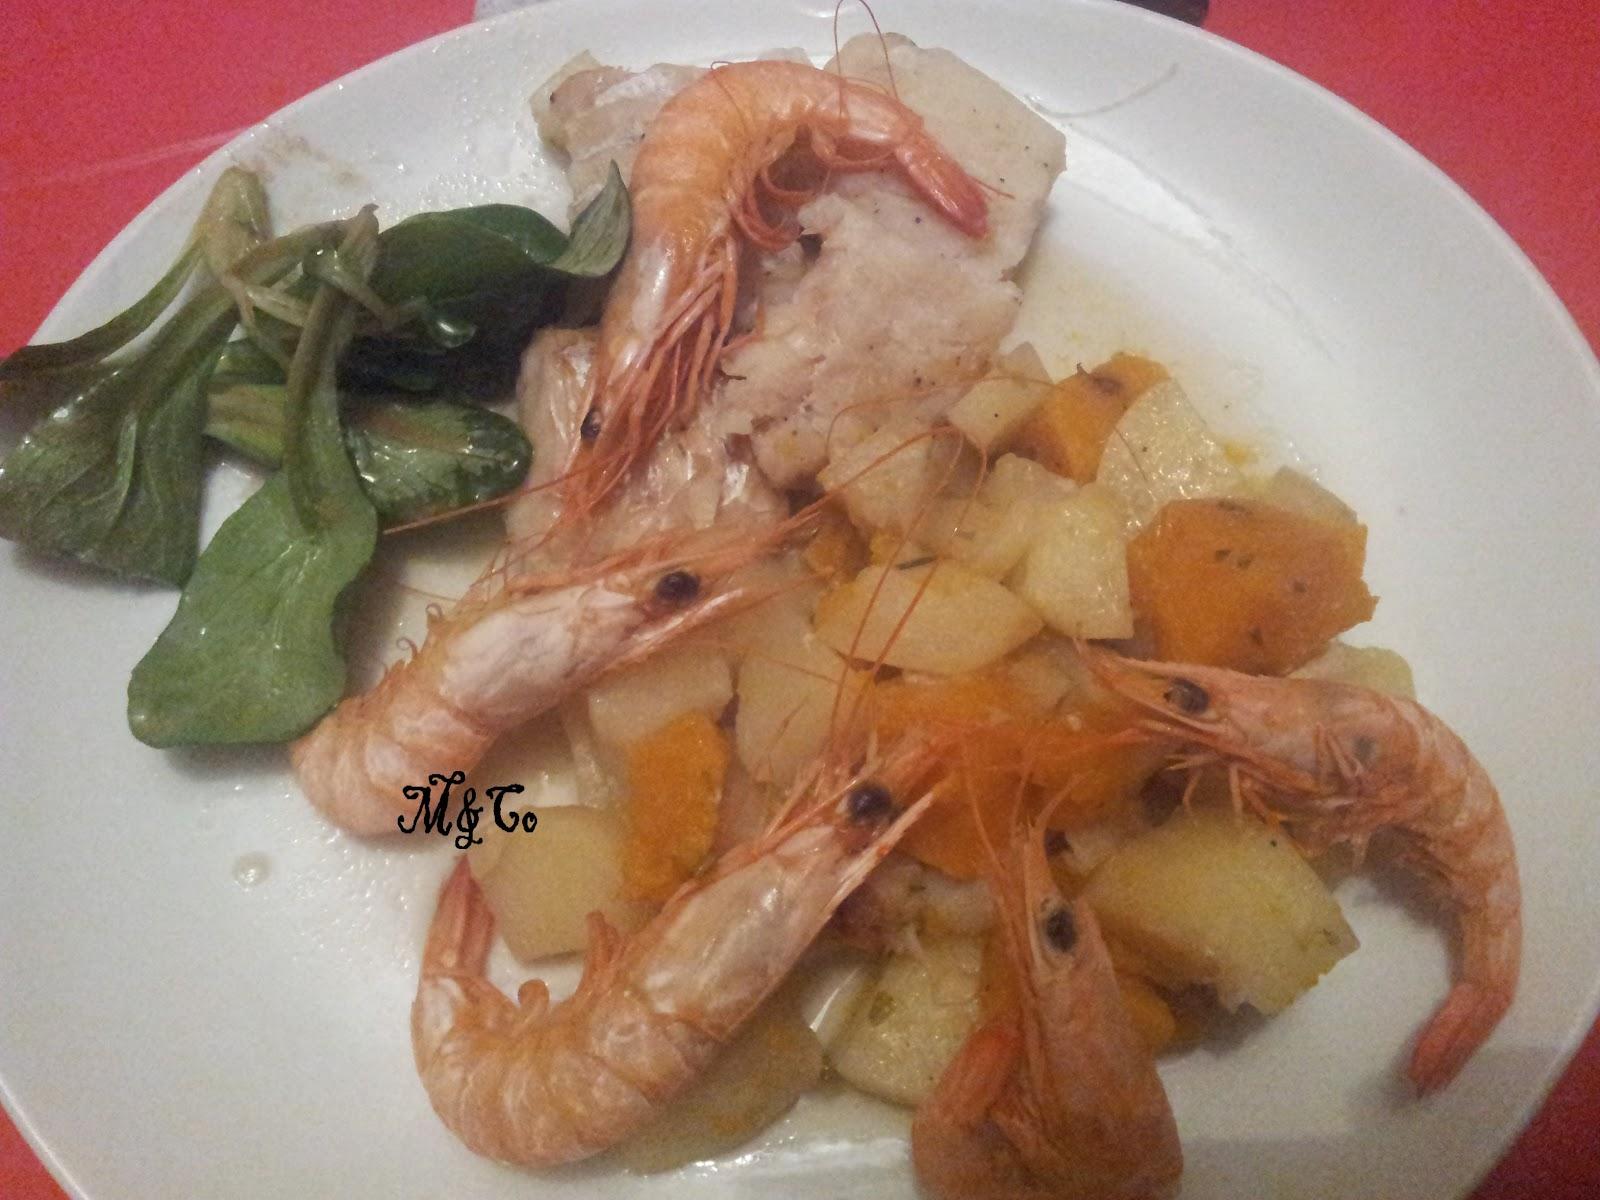 meli melo poisson crevettes patates douces.jpg